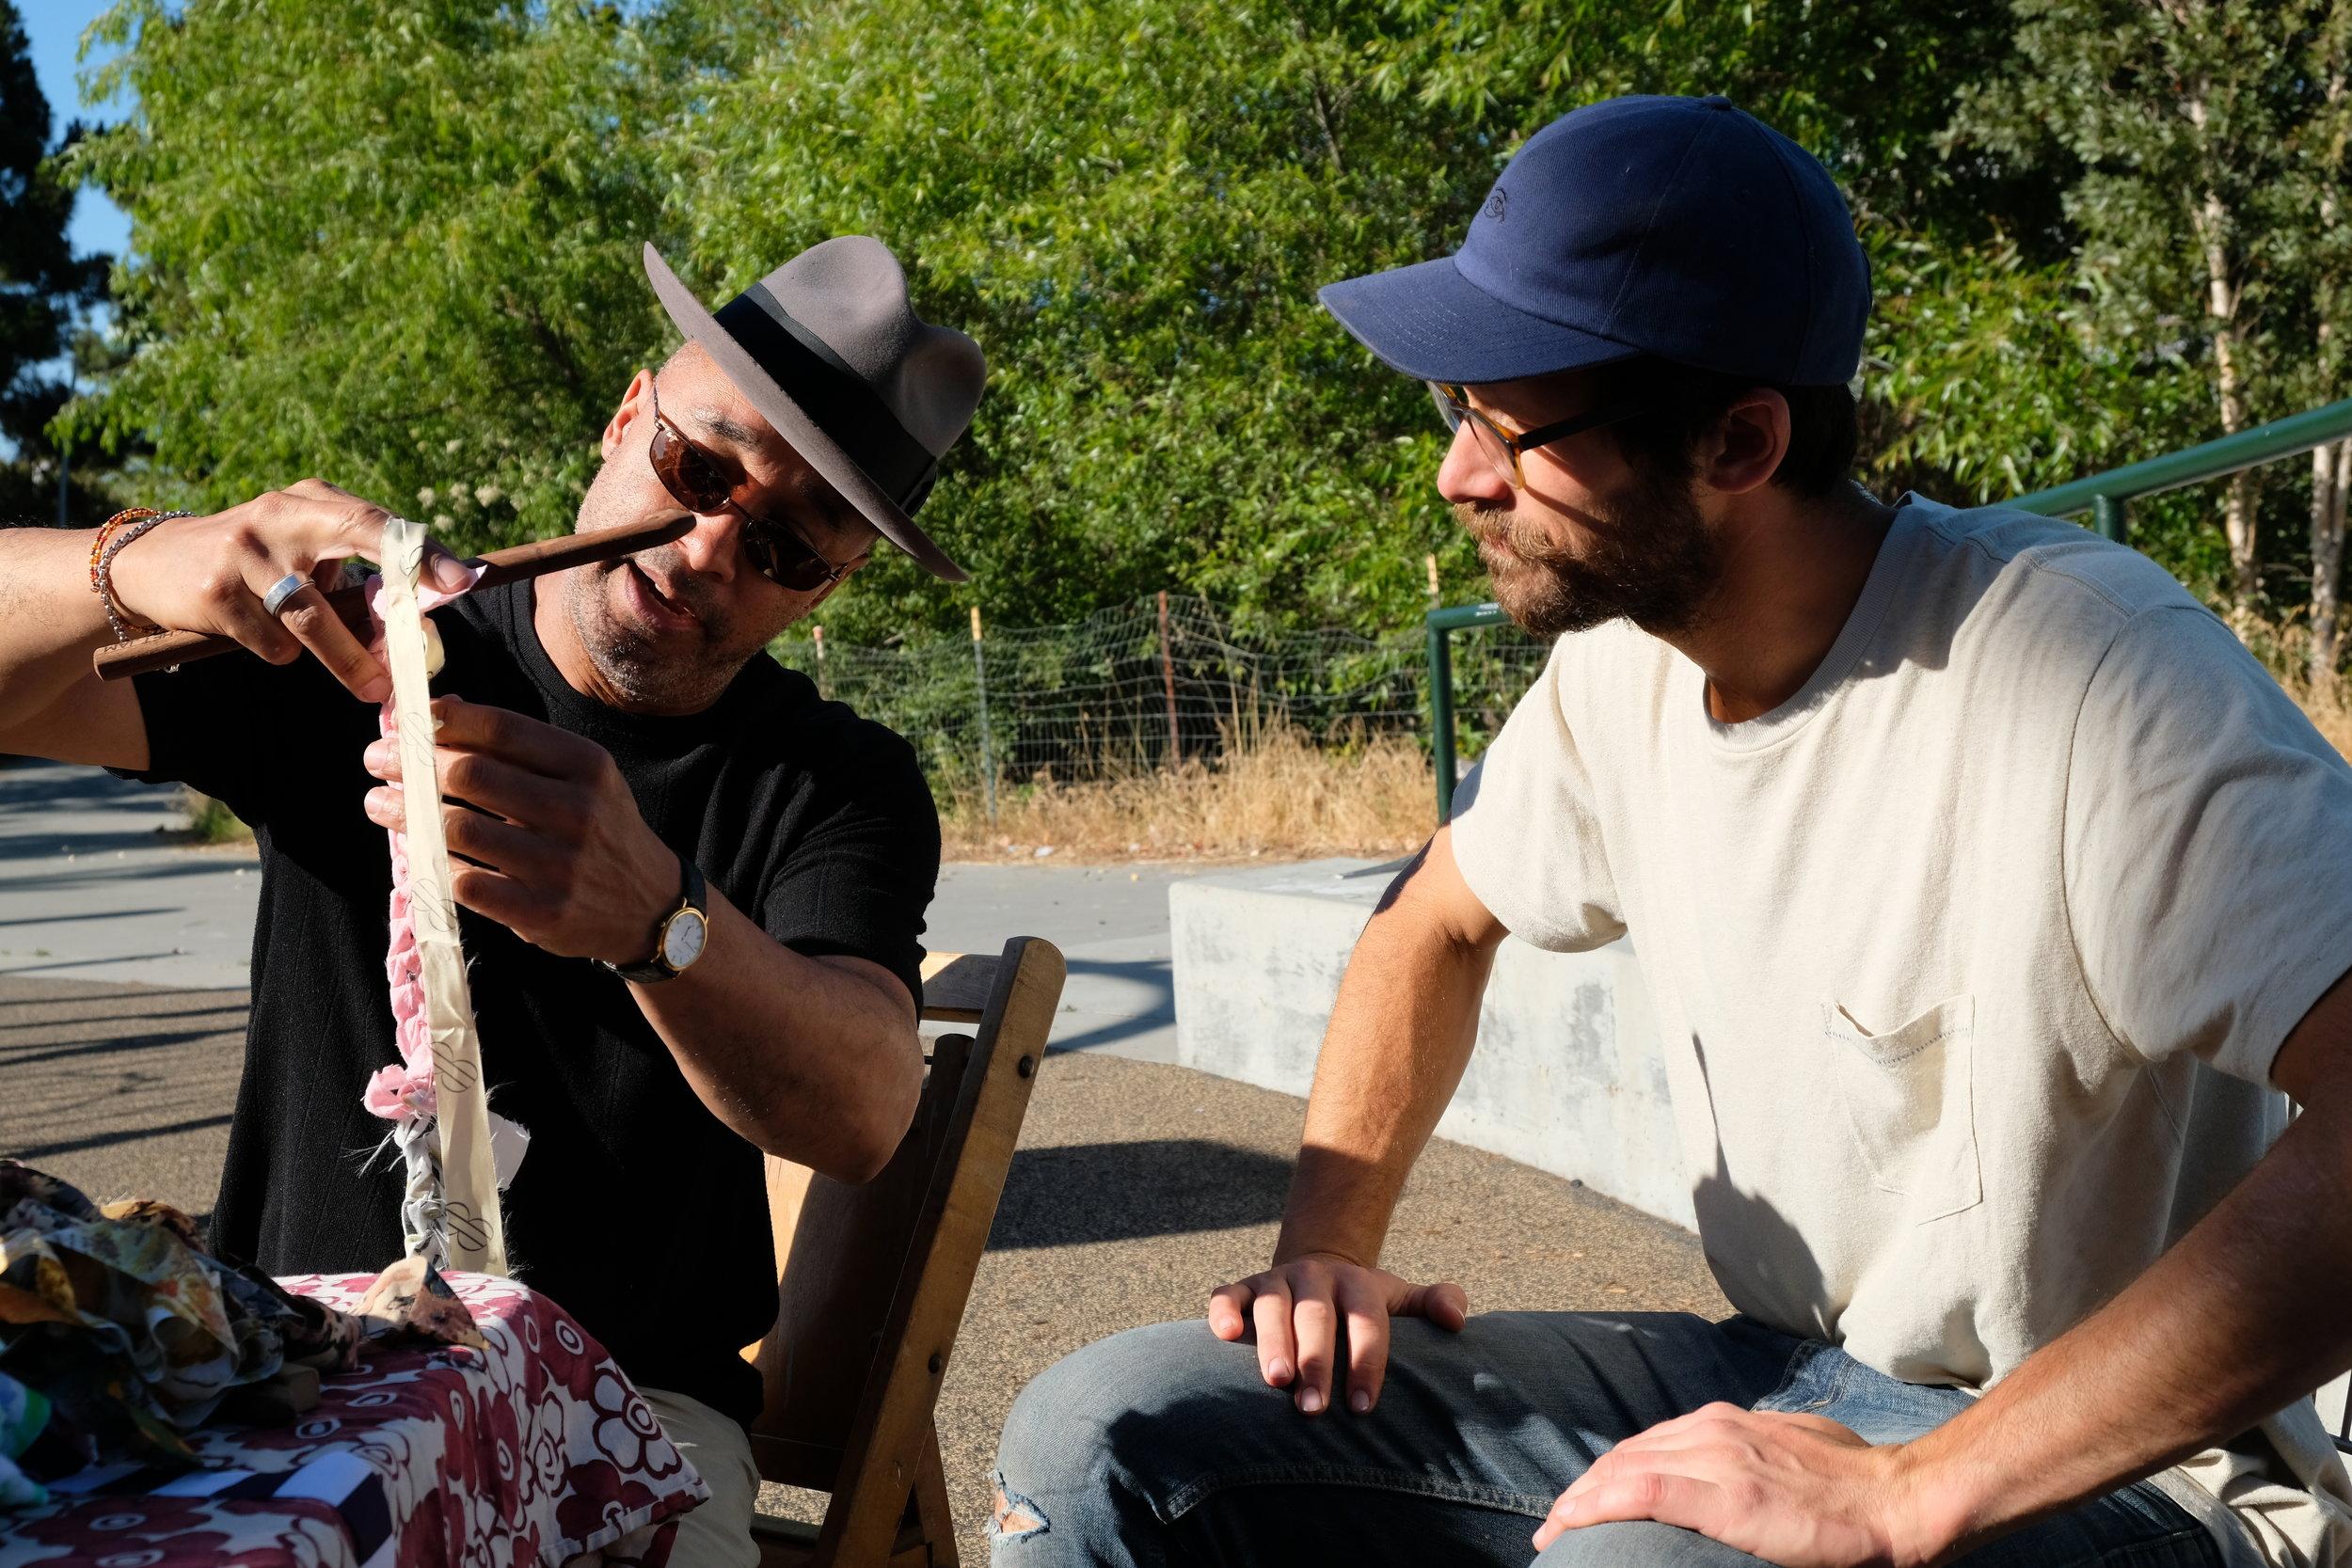 Crochet Jam led by Ramekon O'Arwisters at Peralta Park, Oakland